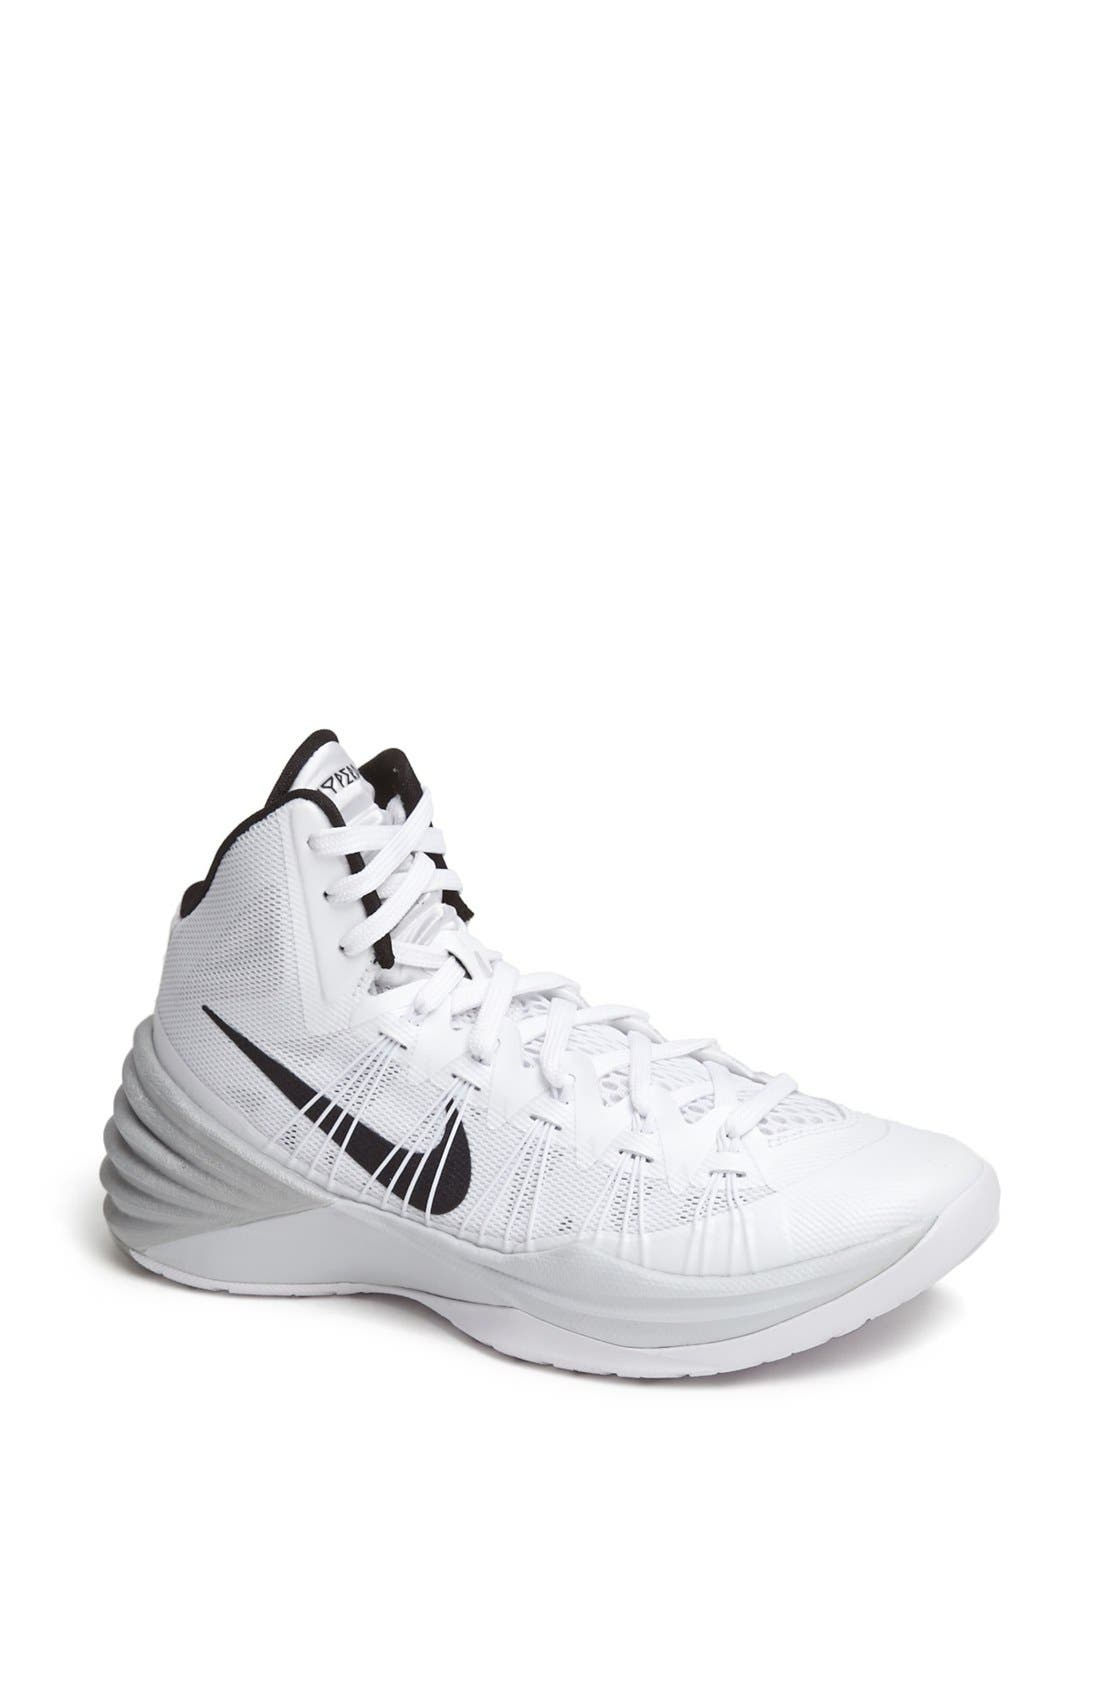 Main Image - Nike 'Hyperdunk' Basketball Shoe (Women)